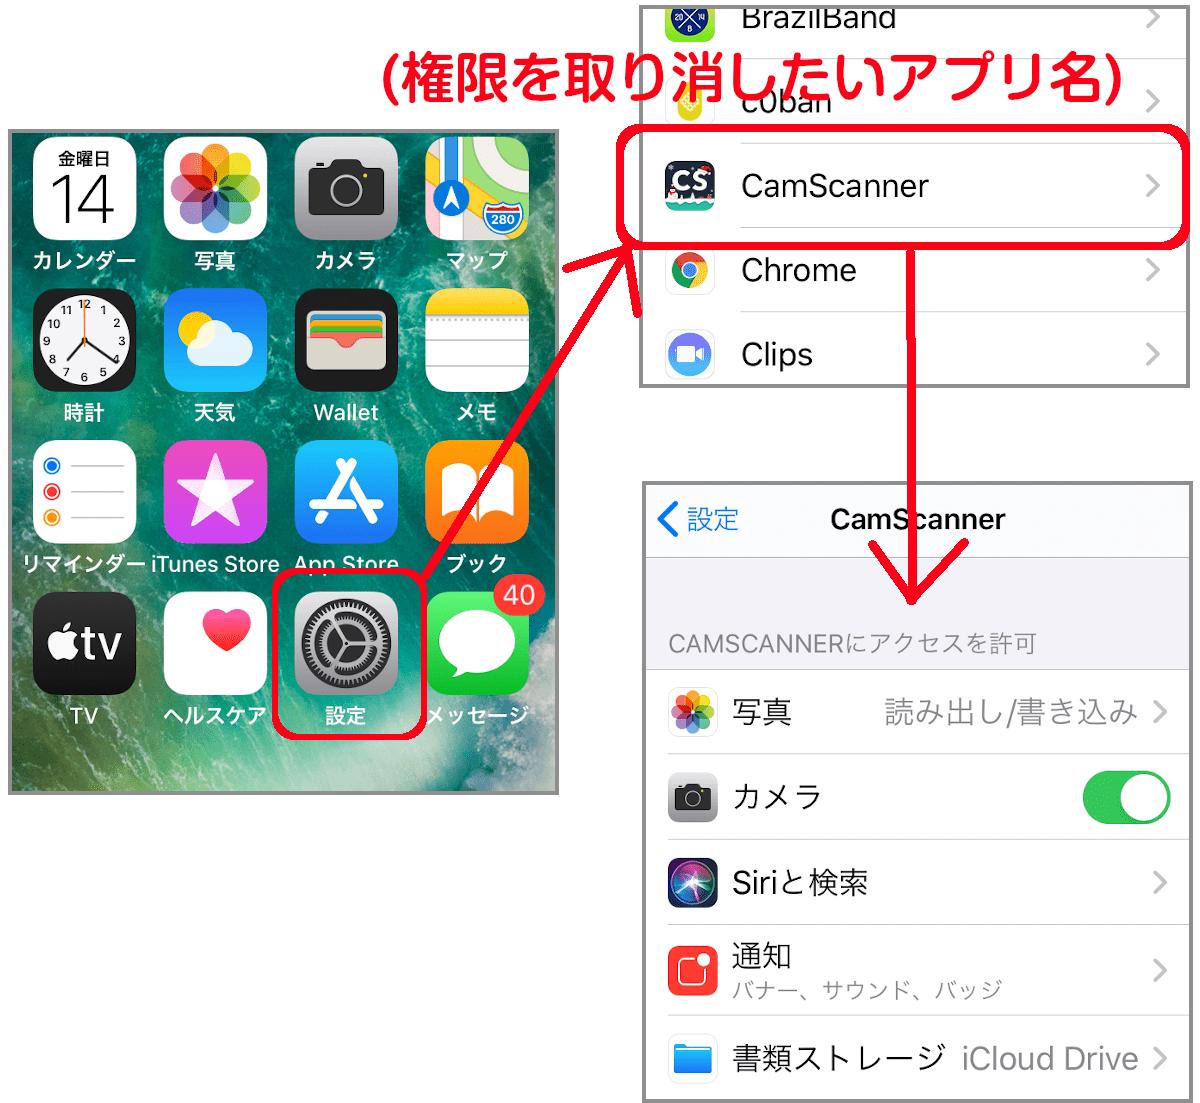 iPhoneで、手動で権限取り消し/許可する 設定→(下の方にスクロール)→(そのアプリの名前) とすると権限の一覧が出ます。